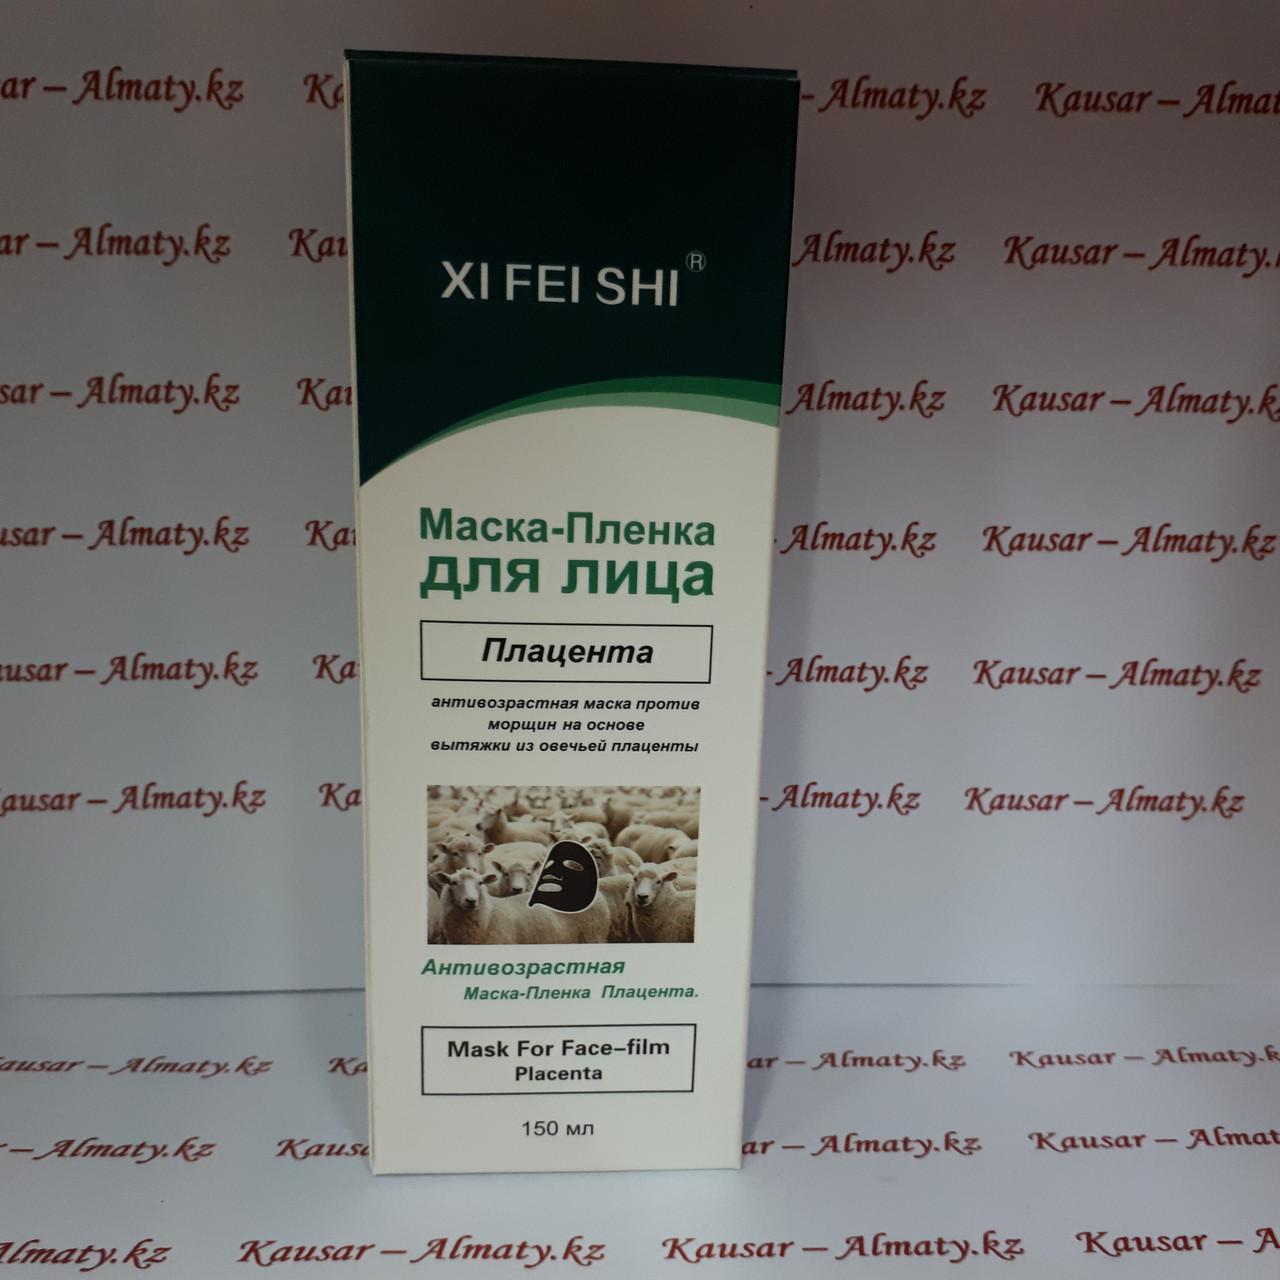 Маска-пленка для лица Xi Fei Shi на основе овечьей плаценты